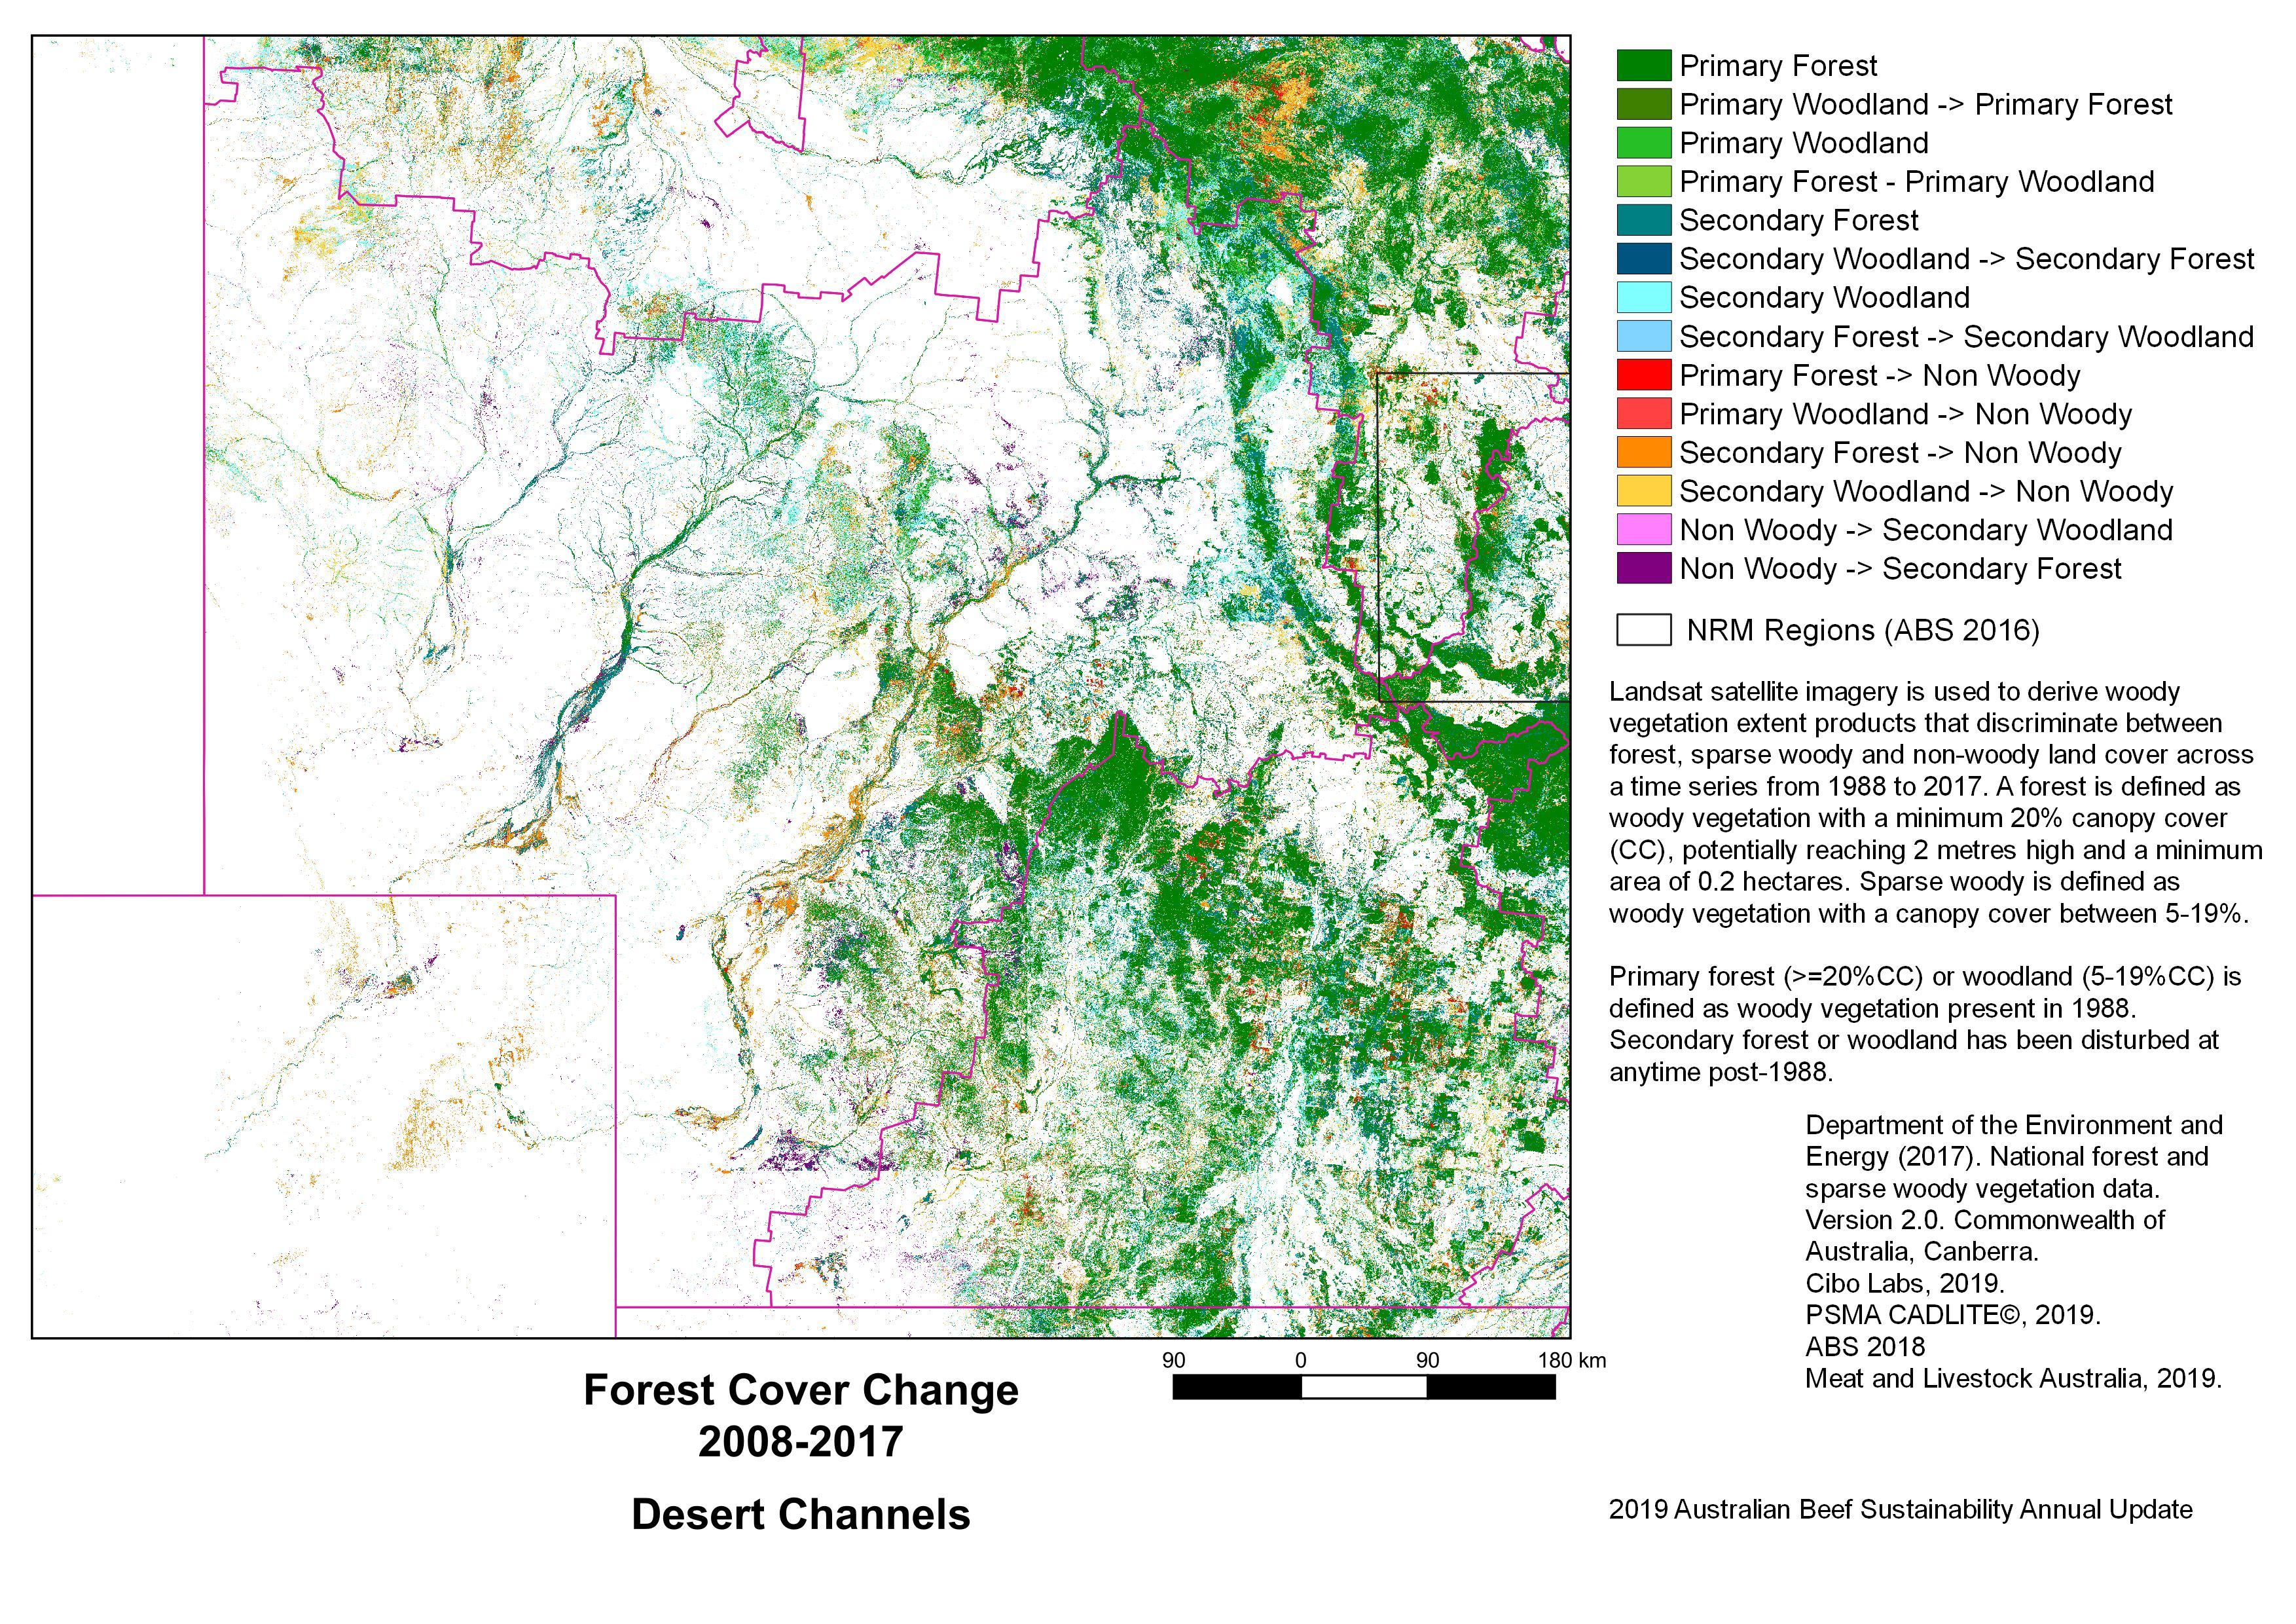 QLD - Desert Channels | Australian Beef Sustainability Framework